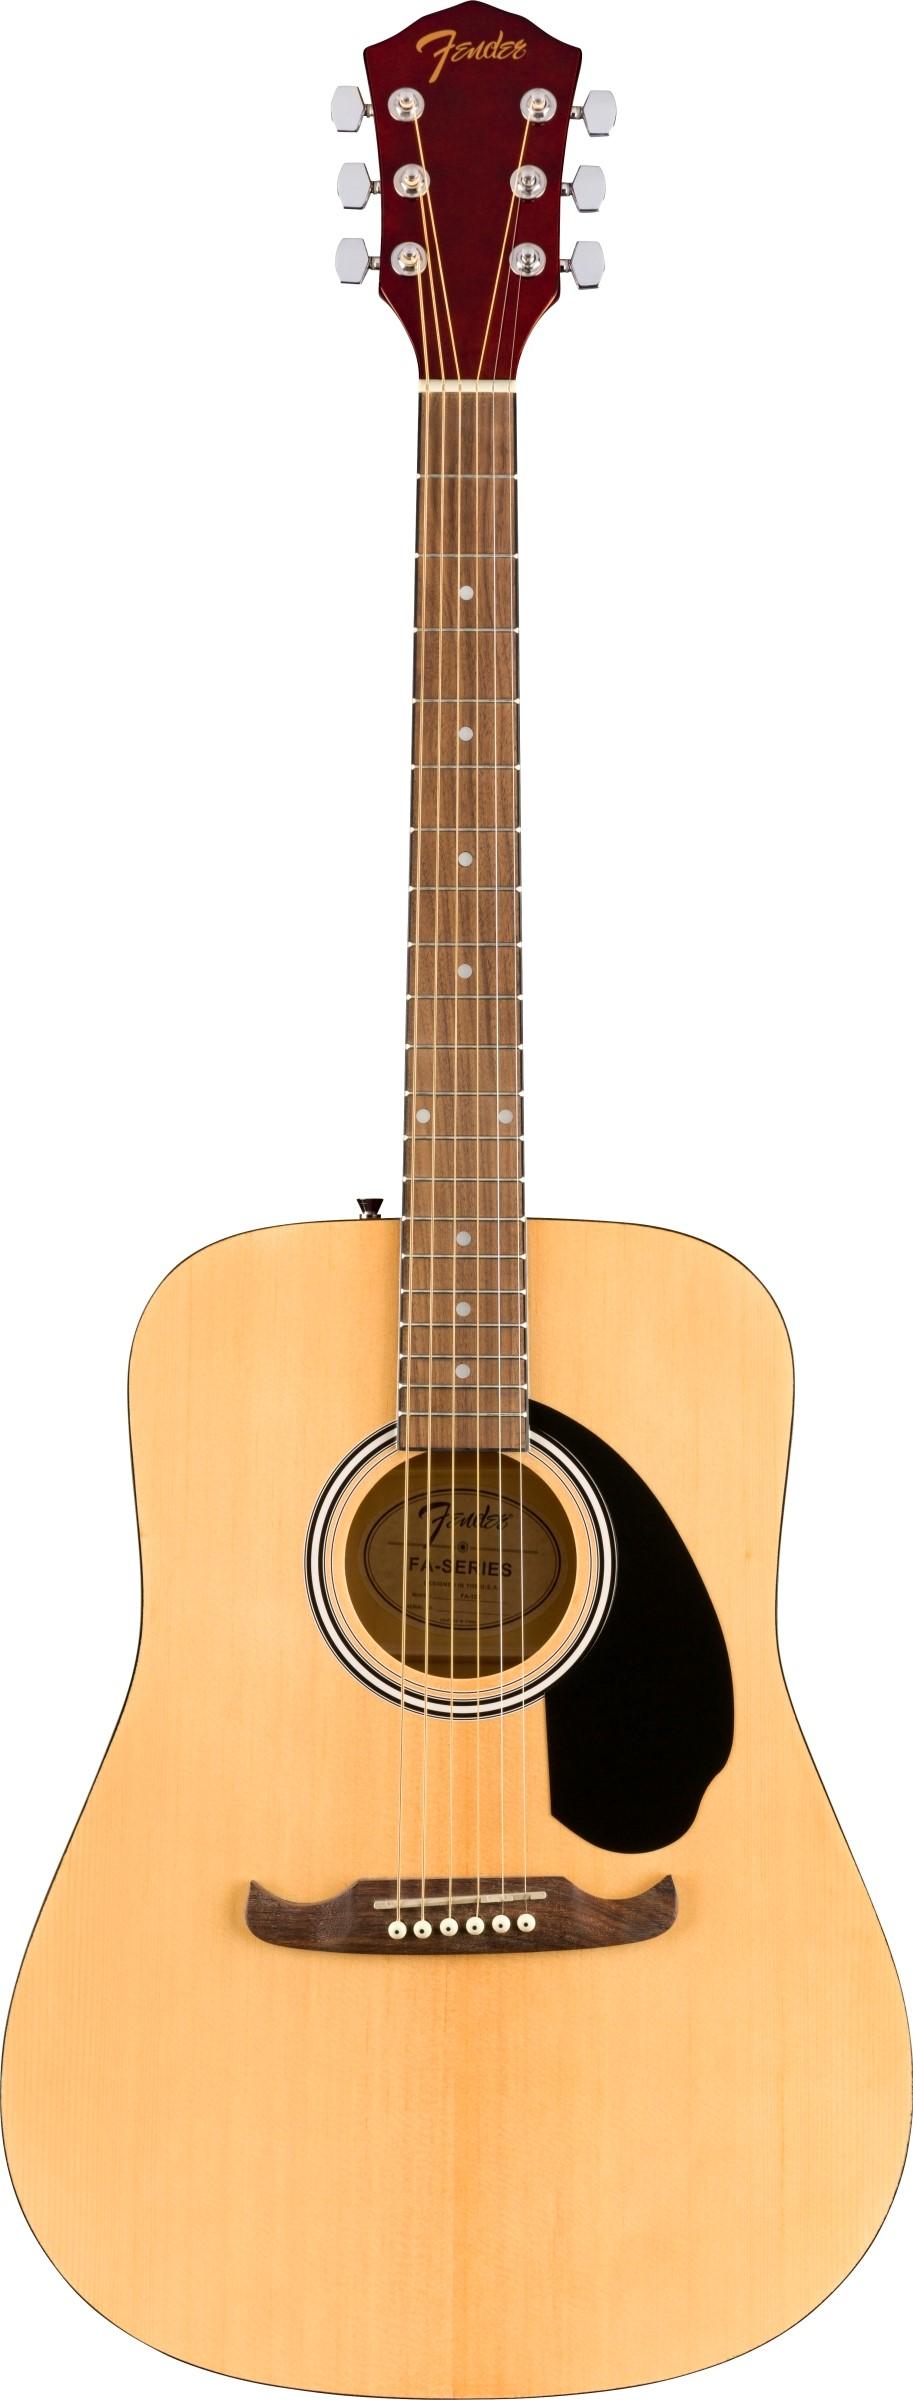 Fender FA-125 Dreadnought - Natural